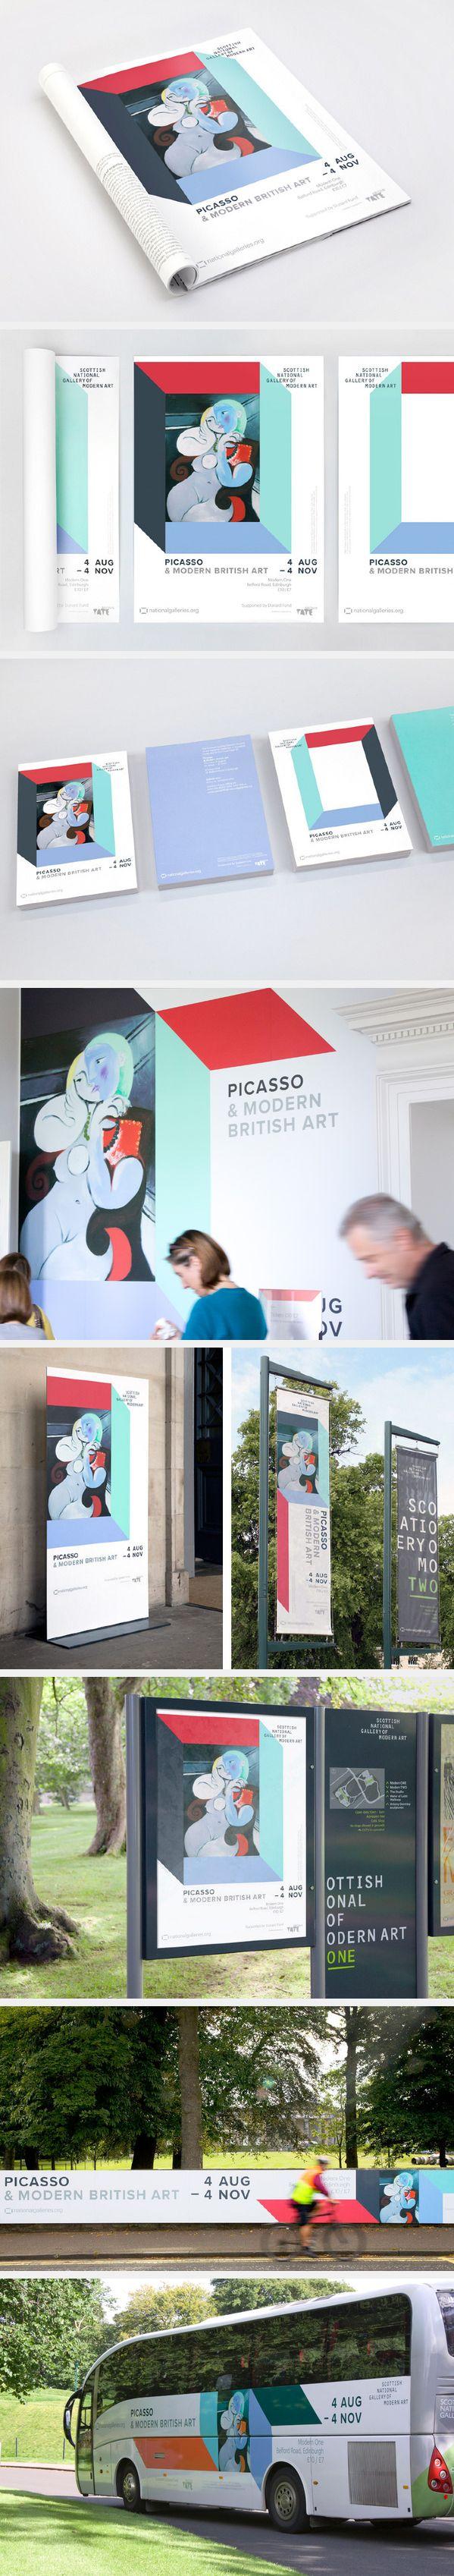 Picasso & Modern British Art by Greig Anderson, via Behance